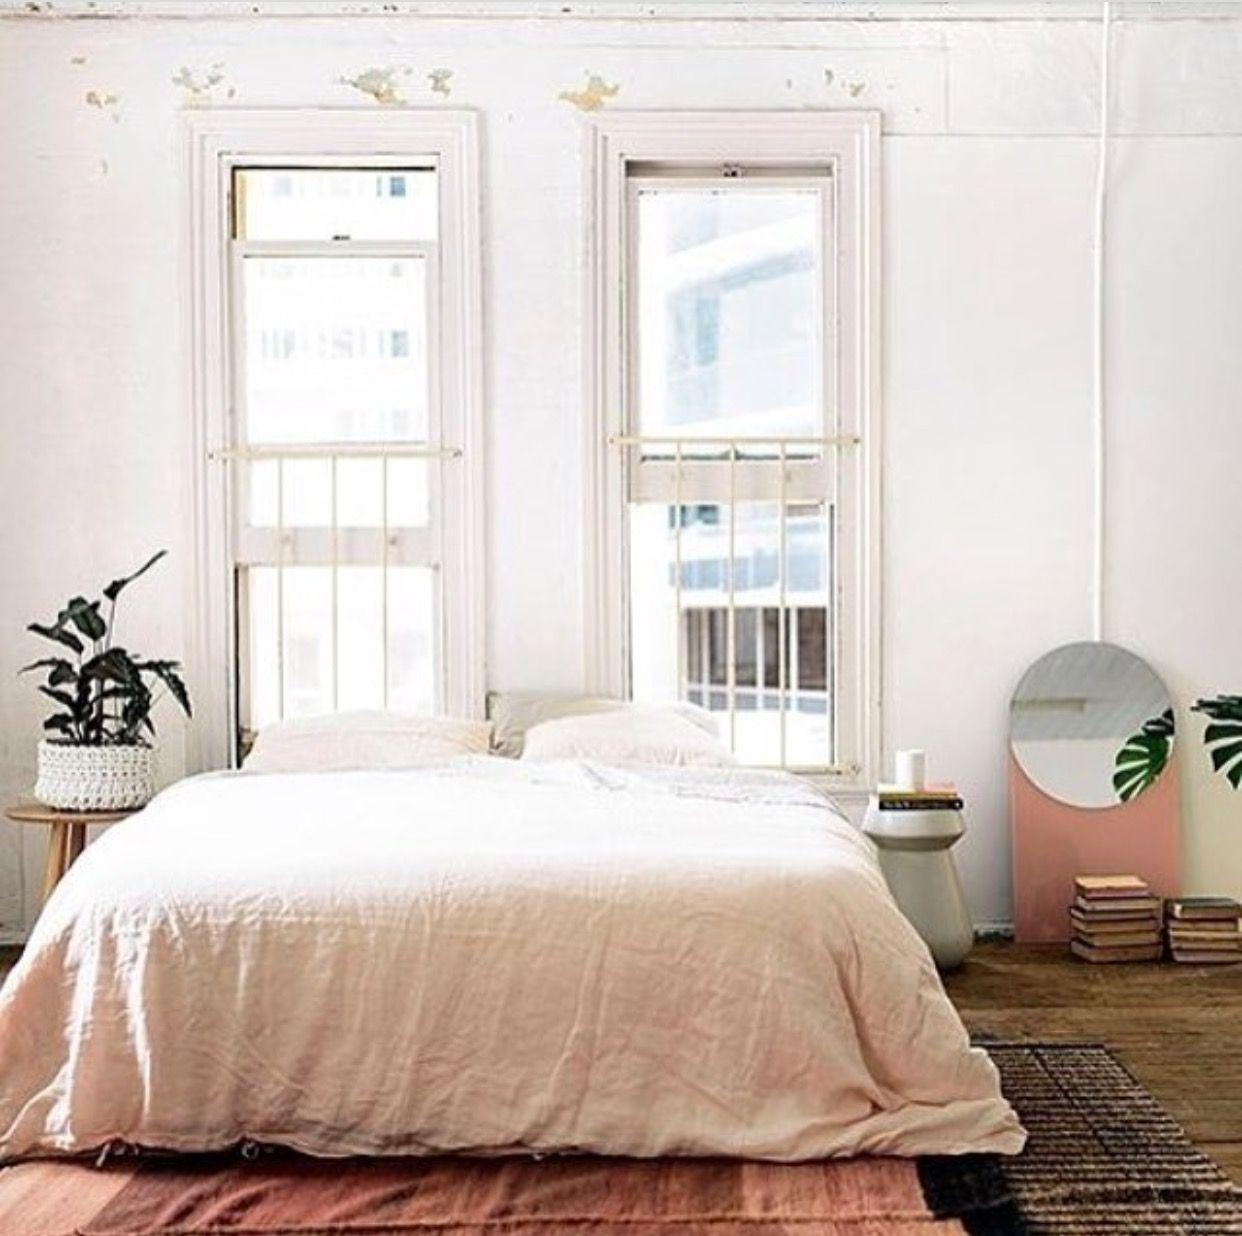 Lights Bedroom DecorBedroom Pin by